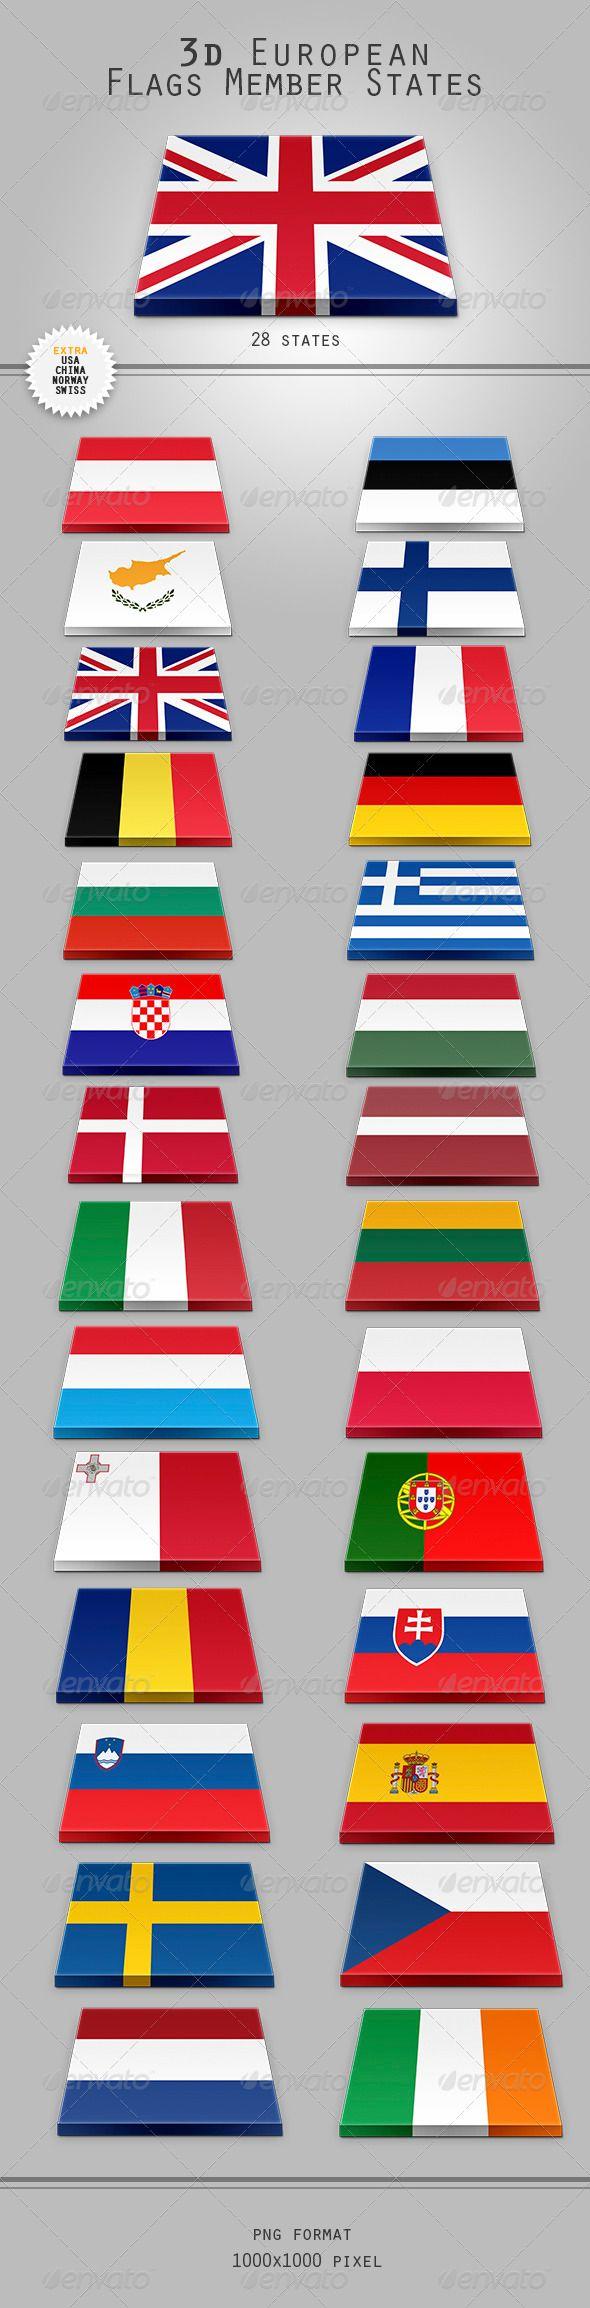 best 25 european flags ideas on pinterest flags of european